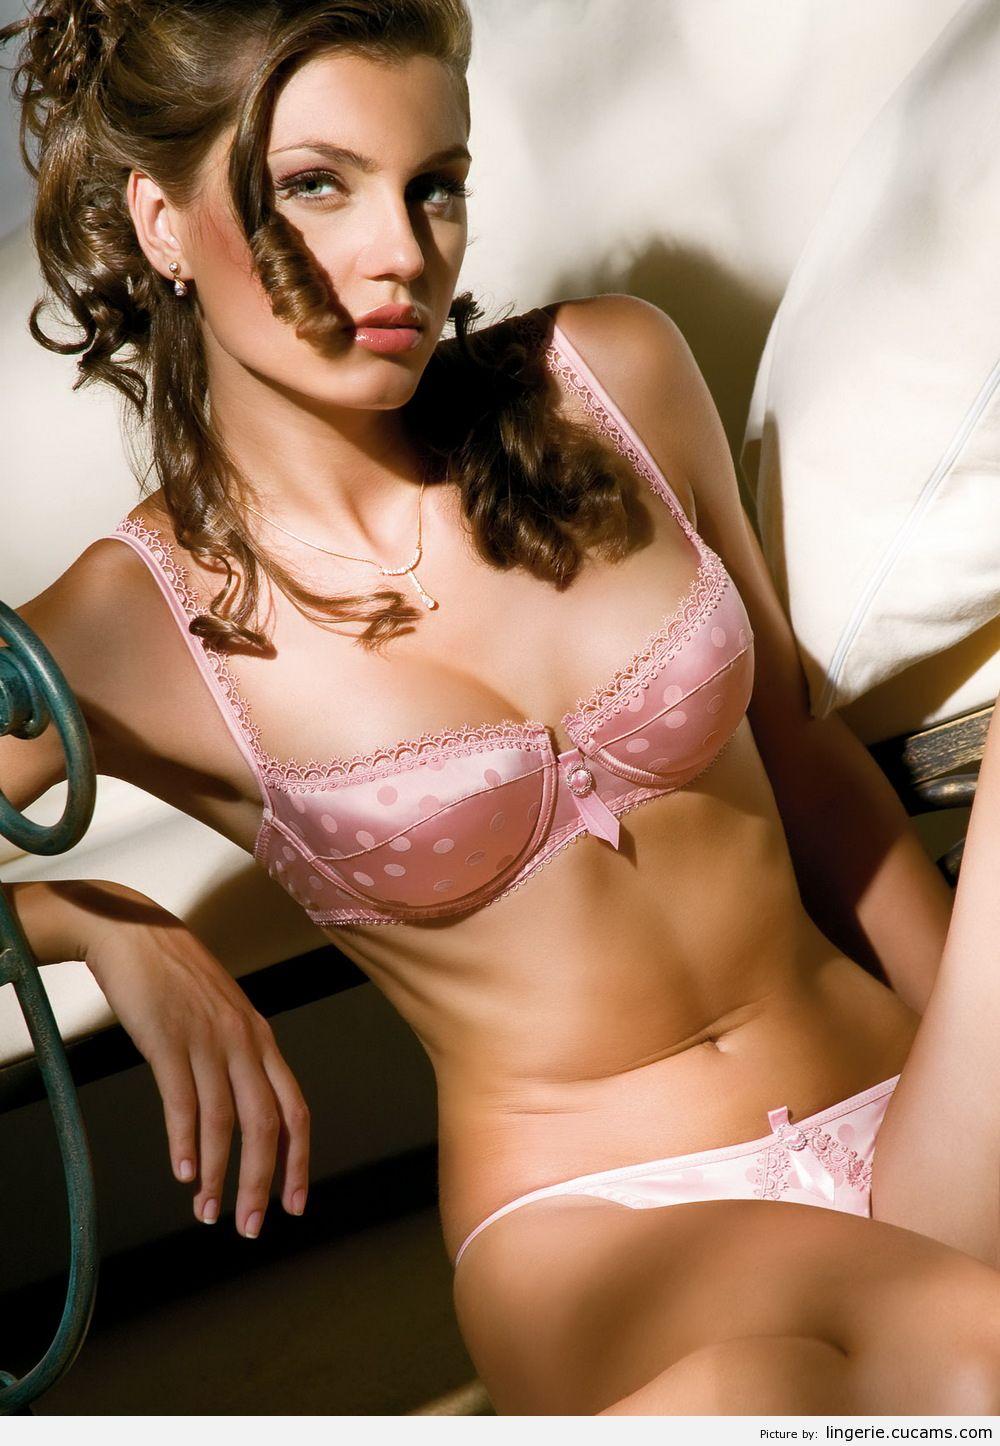 Lingerie Lingerie Model by lingerie.cucams.com